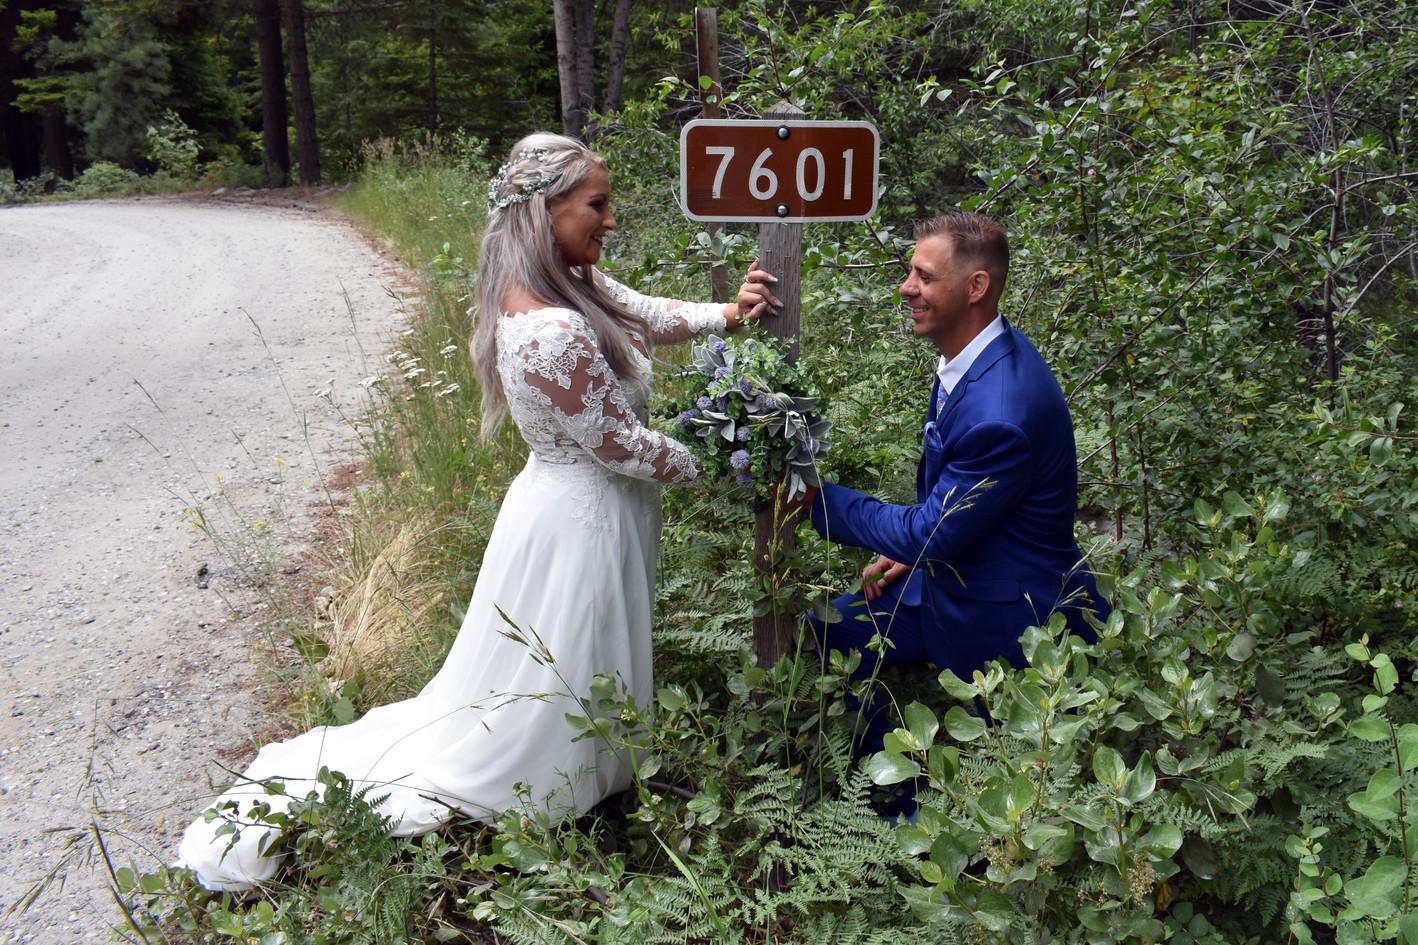 DSC_0808 copy wedding photographer yakima EDITED NO LOGO.jpg